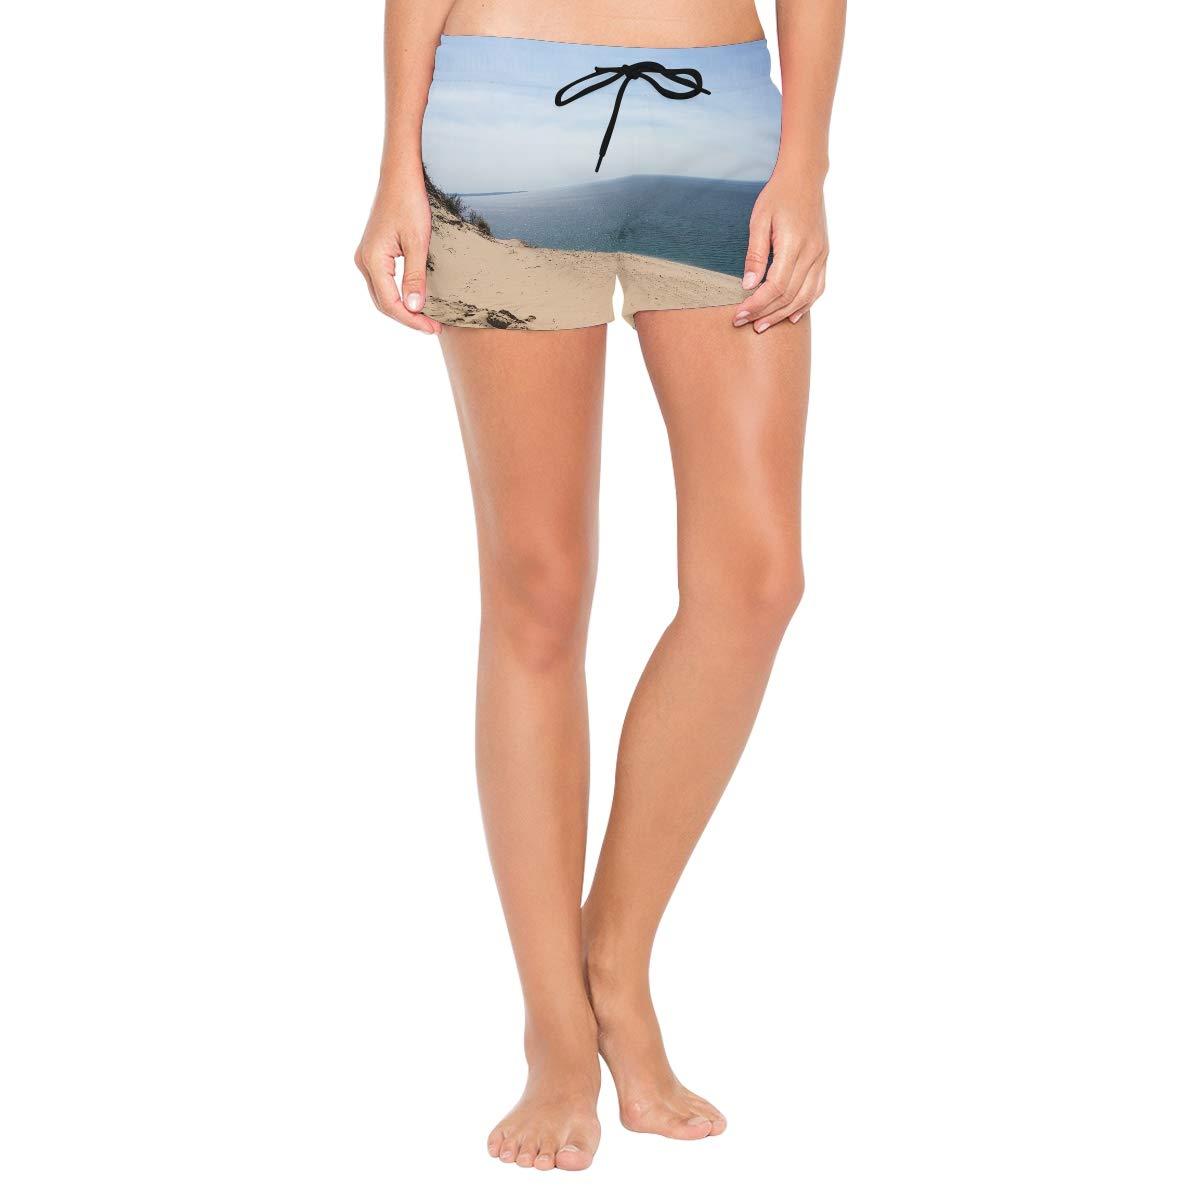 NWTSPY Sleepy Tater Womens Sport Beach Swim Shorts Board Shorts Swimsuit with Mesh Lining